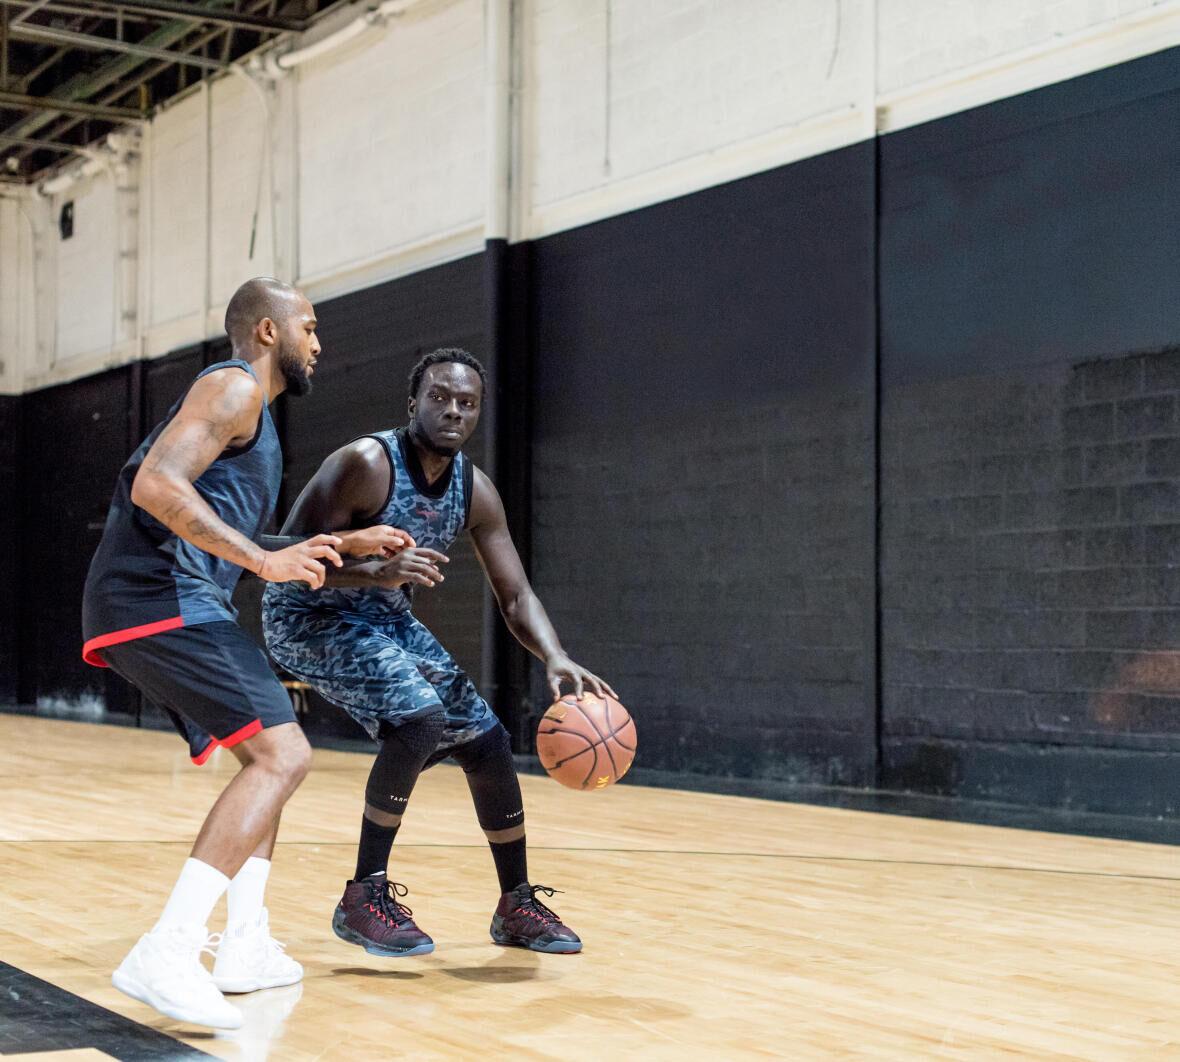 conseil pendant un match basketball